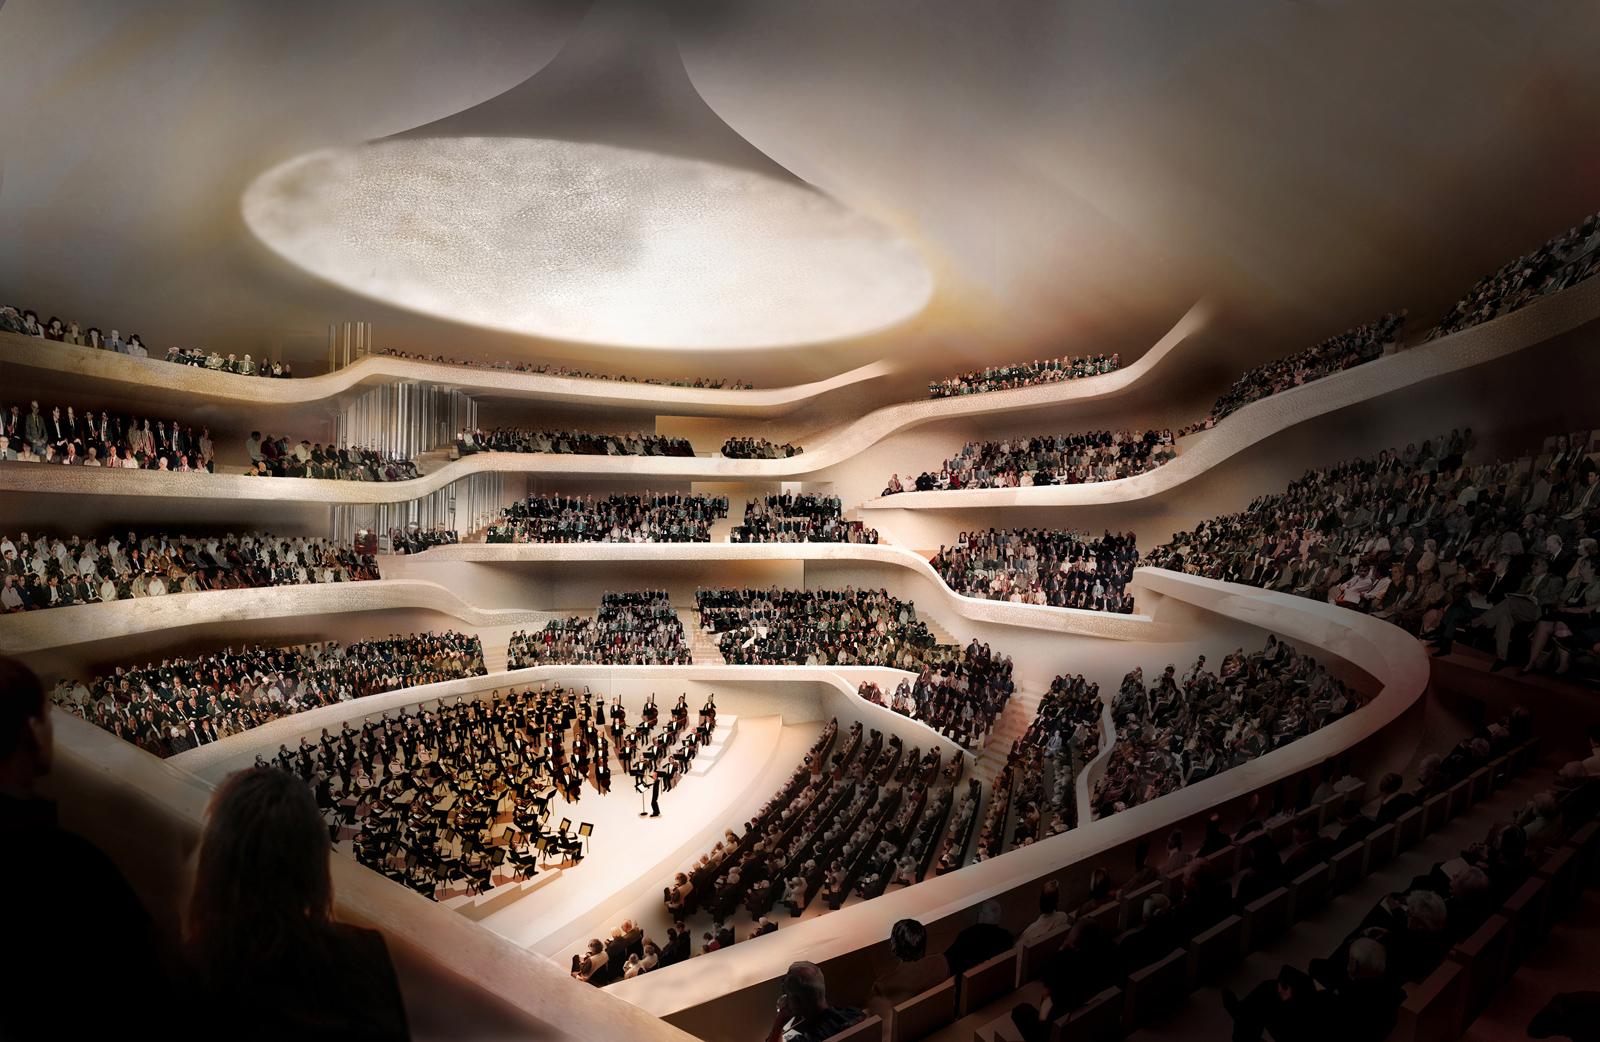 Illustration of the Grand Hall © Herzog & de Meuron